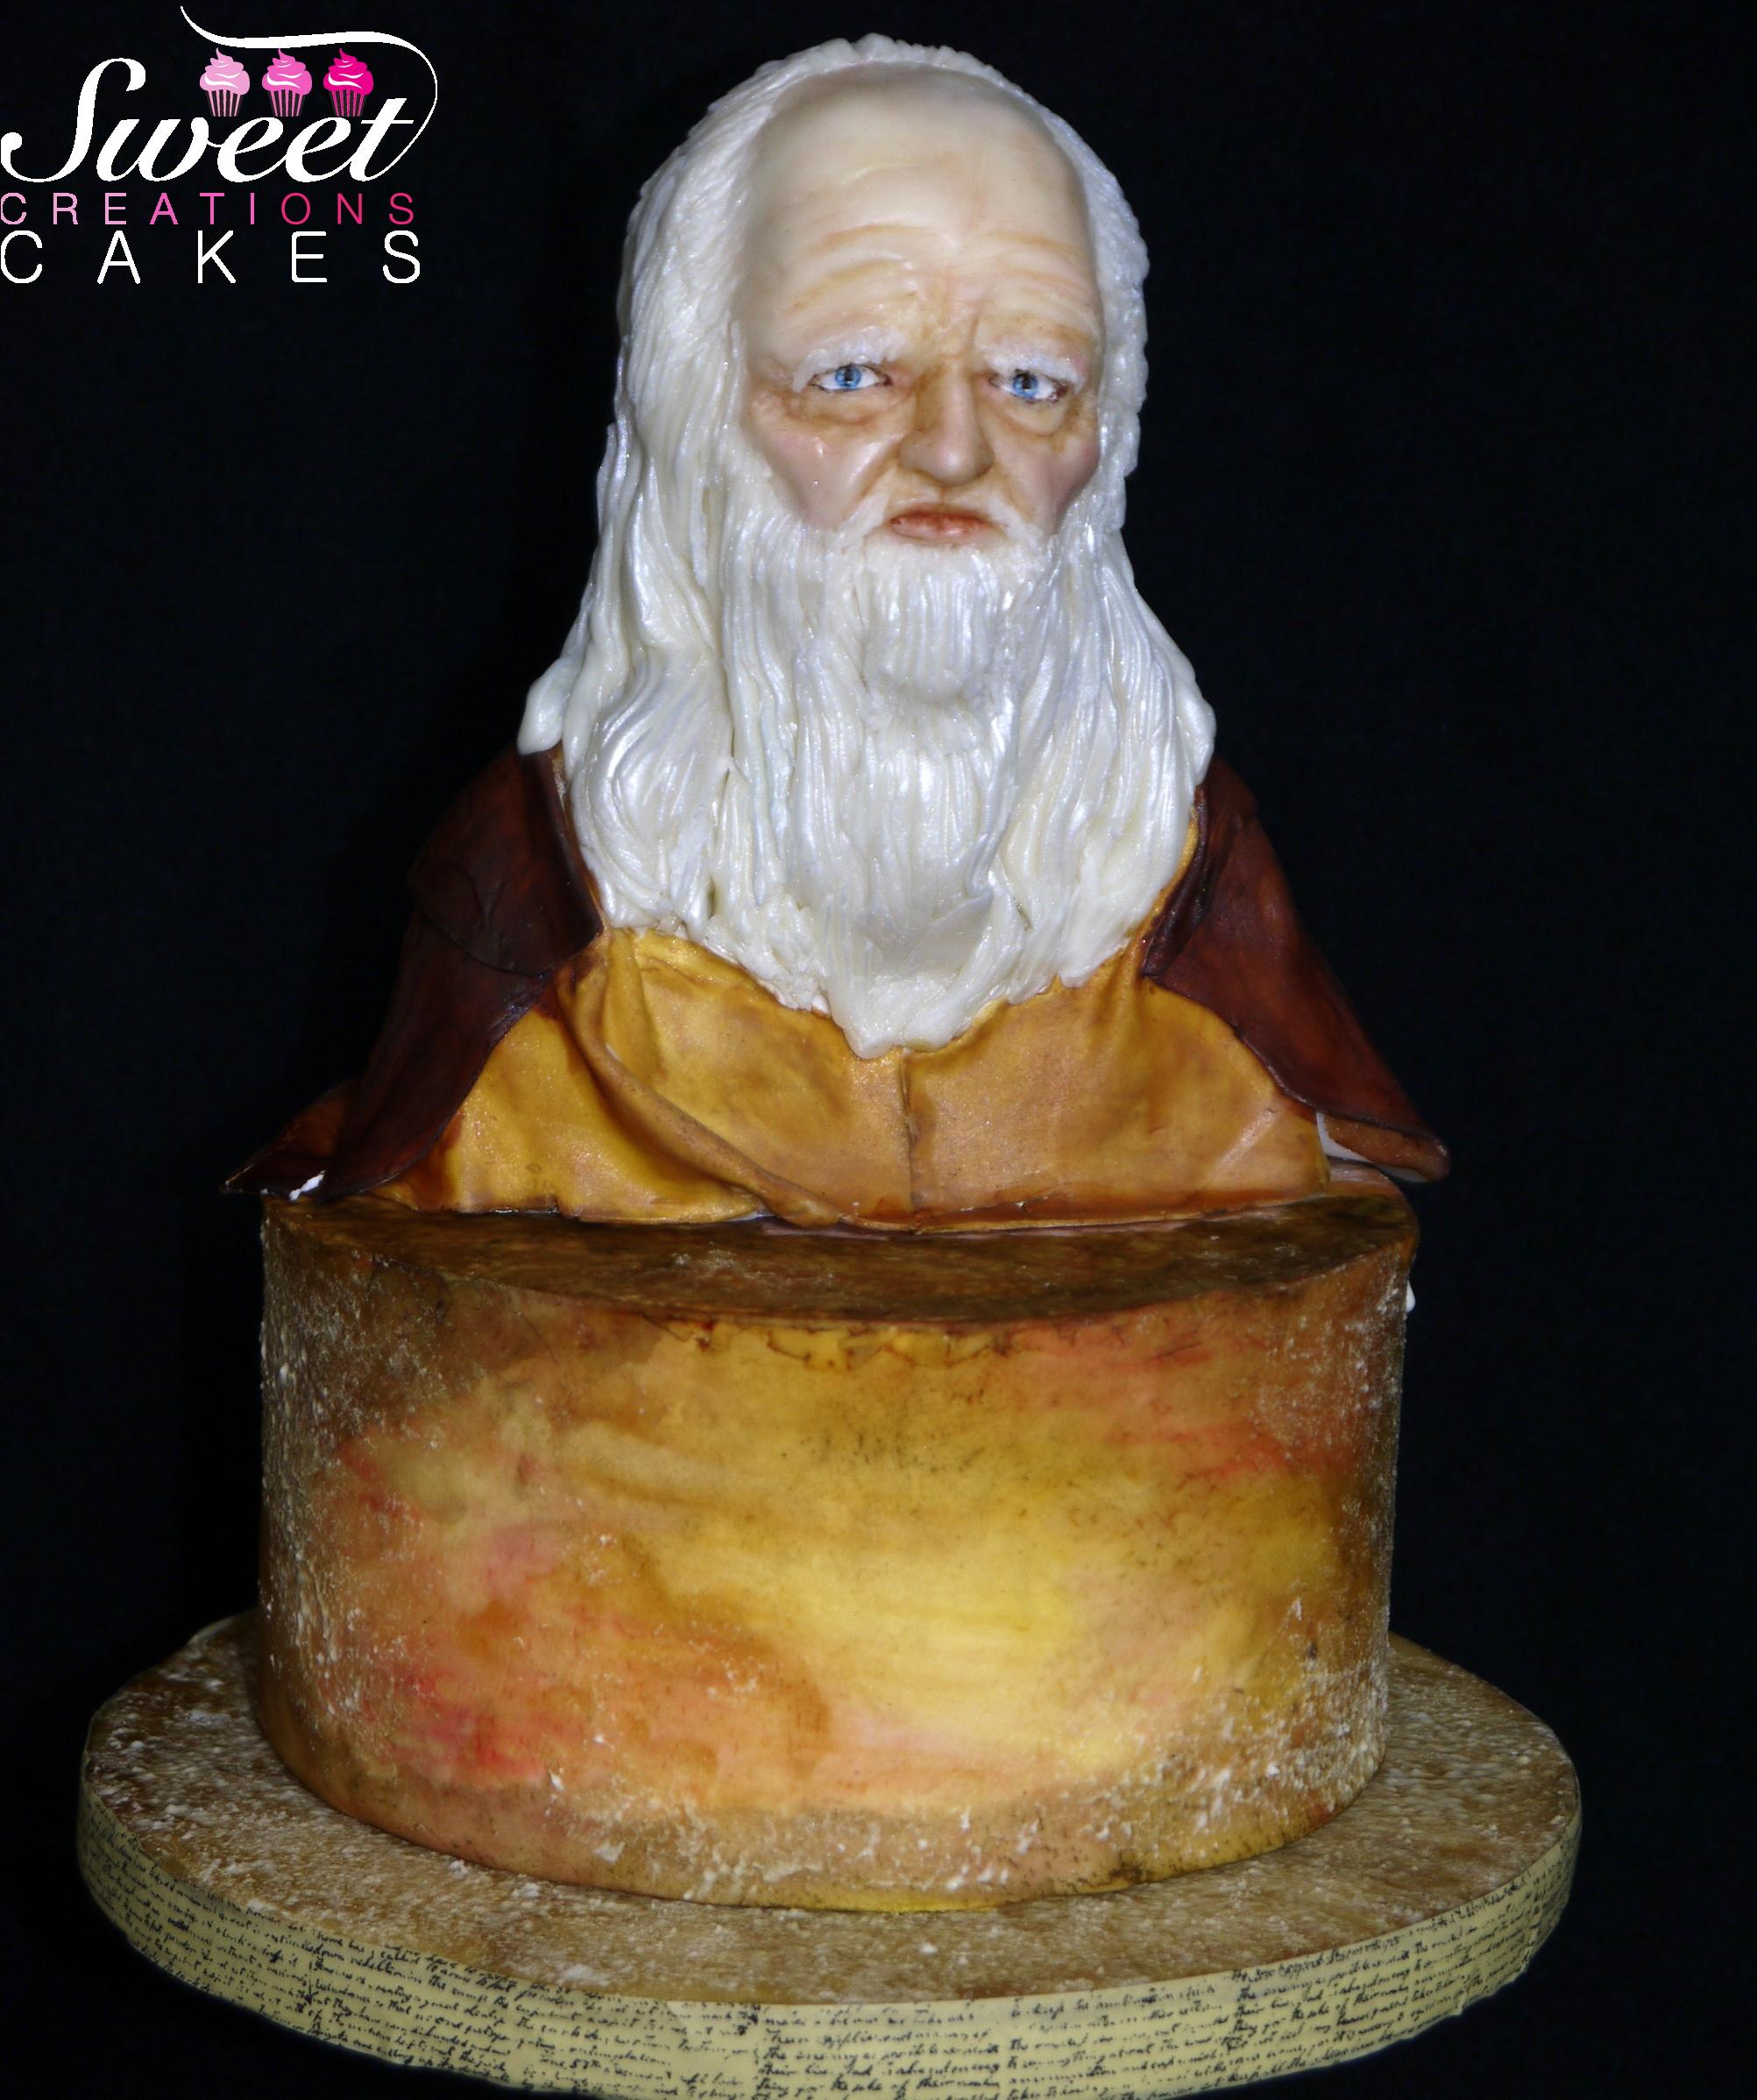 1.-Bouchra-Marir_Sweet-Creations-Cakes-_Self-Portrait-Leonardo-da-Vinci.JPG#asset:18146